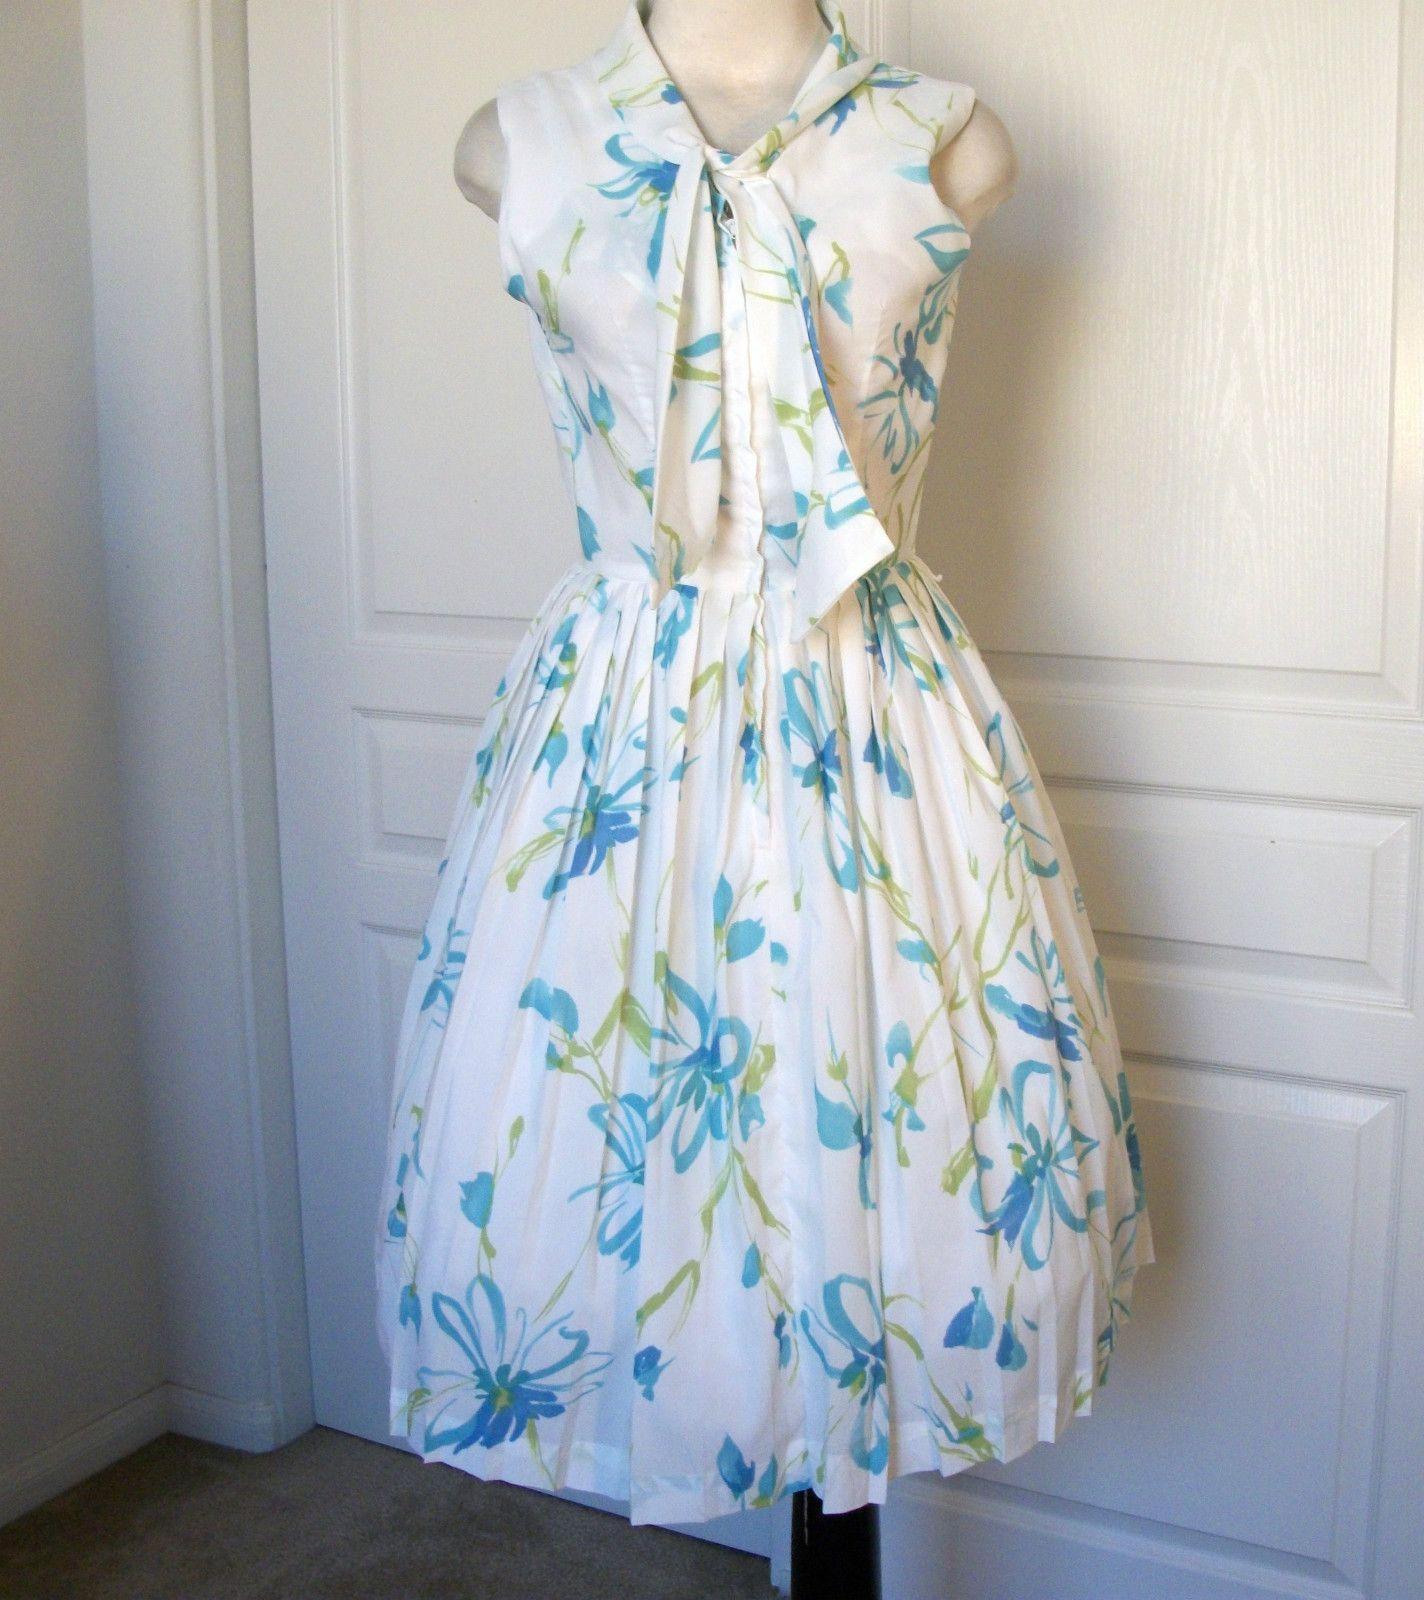 VTG 50s watercolors floral full skirt cotton garden party dress ...